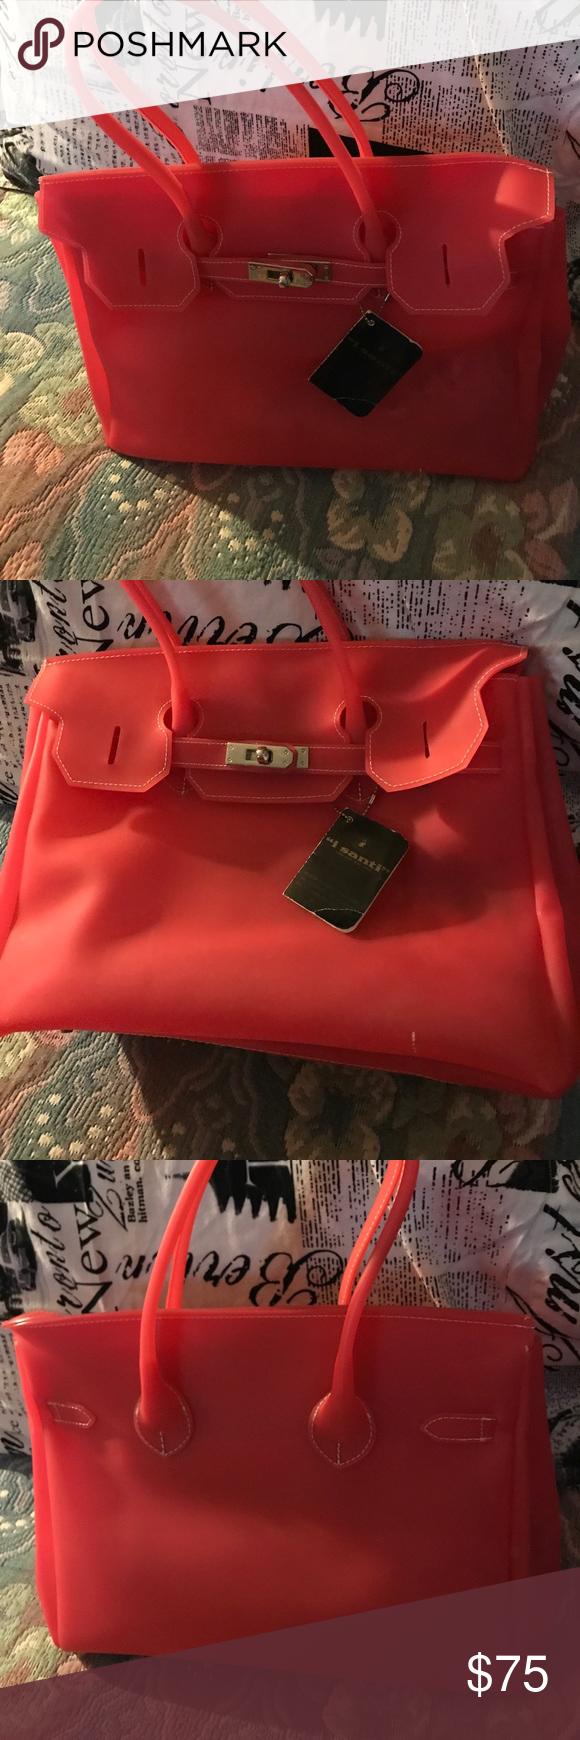 I Santi Jelly Bag Beautiful Italian Handbag Fashion Style Brand New Just D